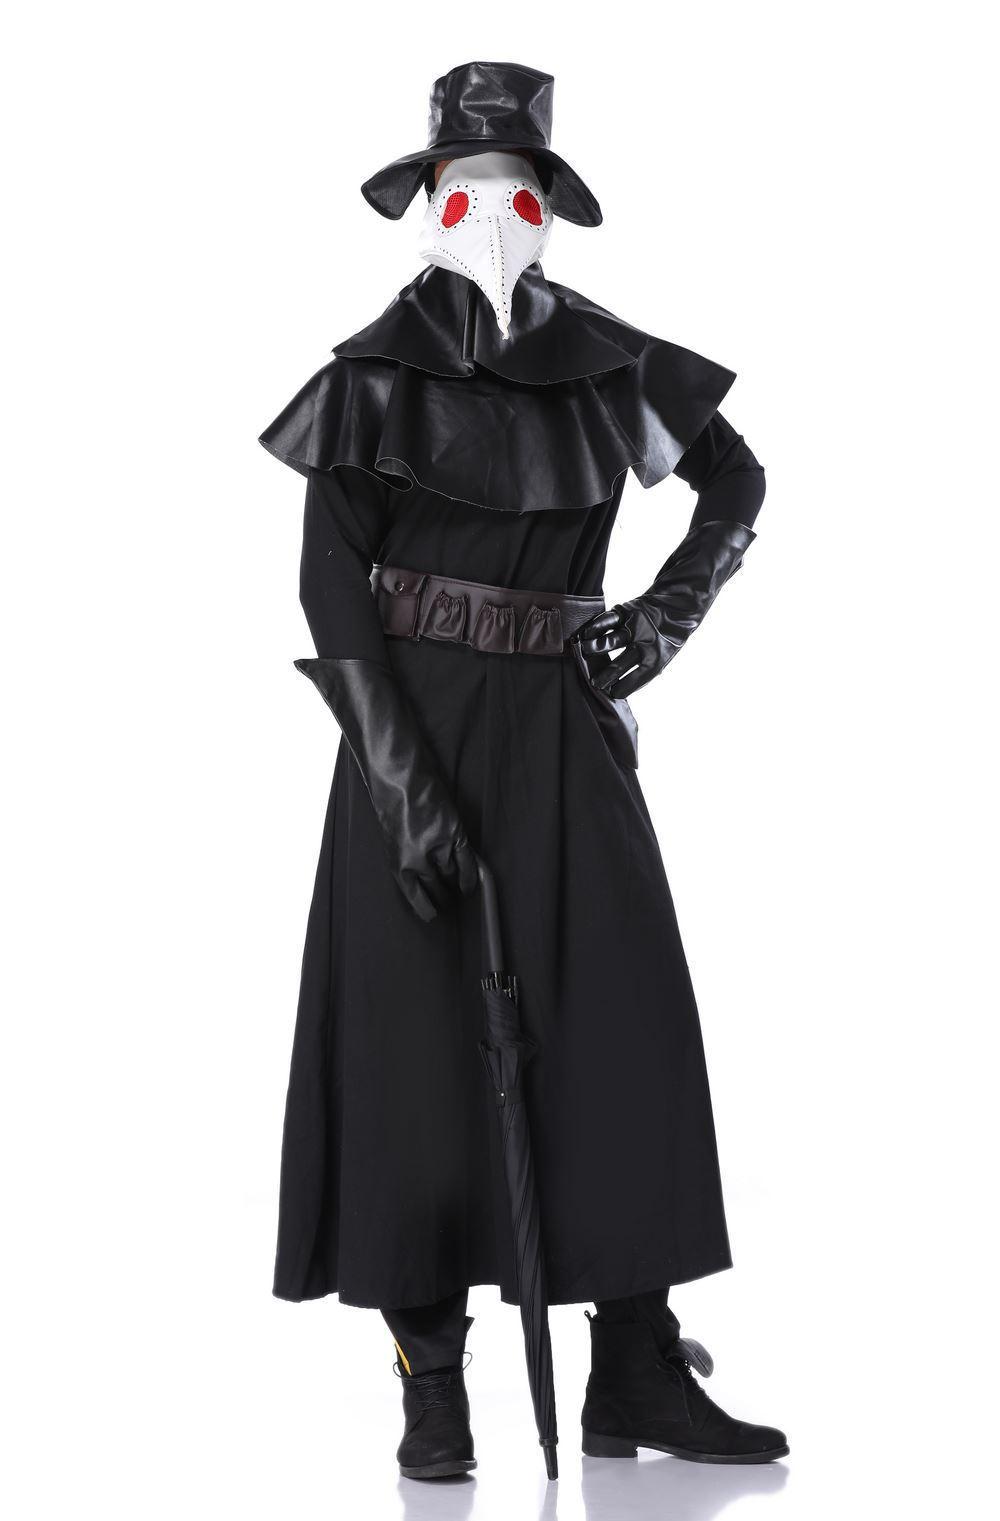 Halloween Cosplay plague beak doctor costume dark hero costume Venice carnival dress up 1